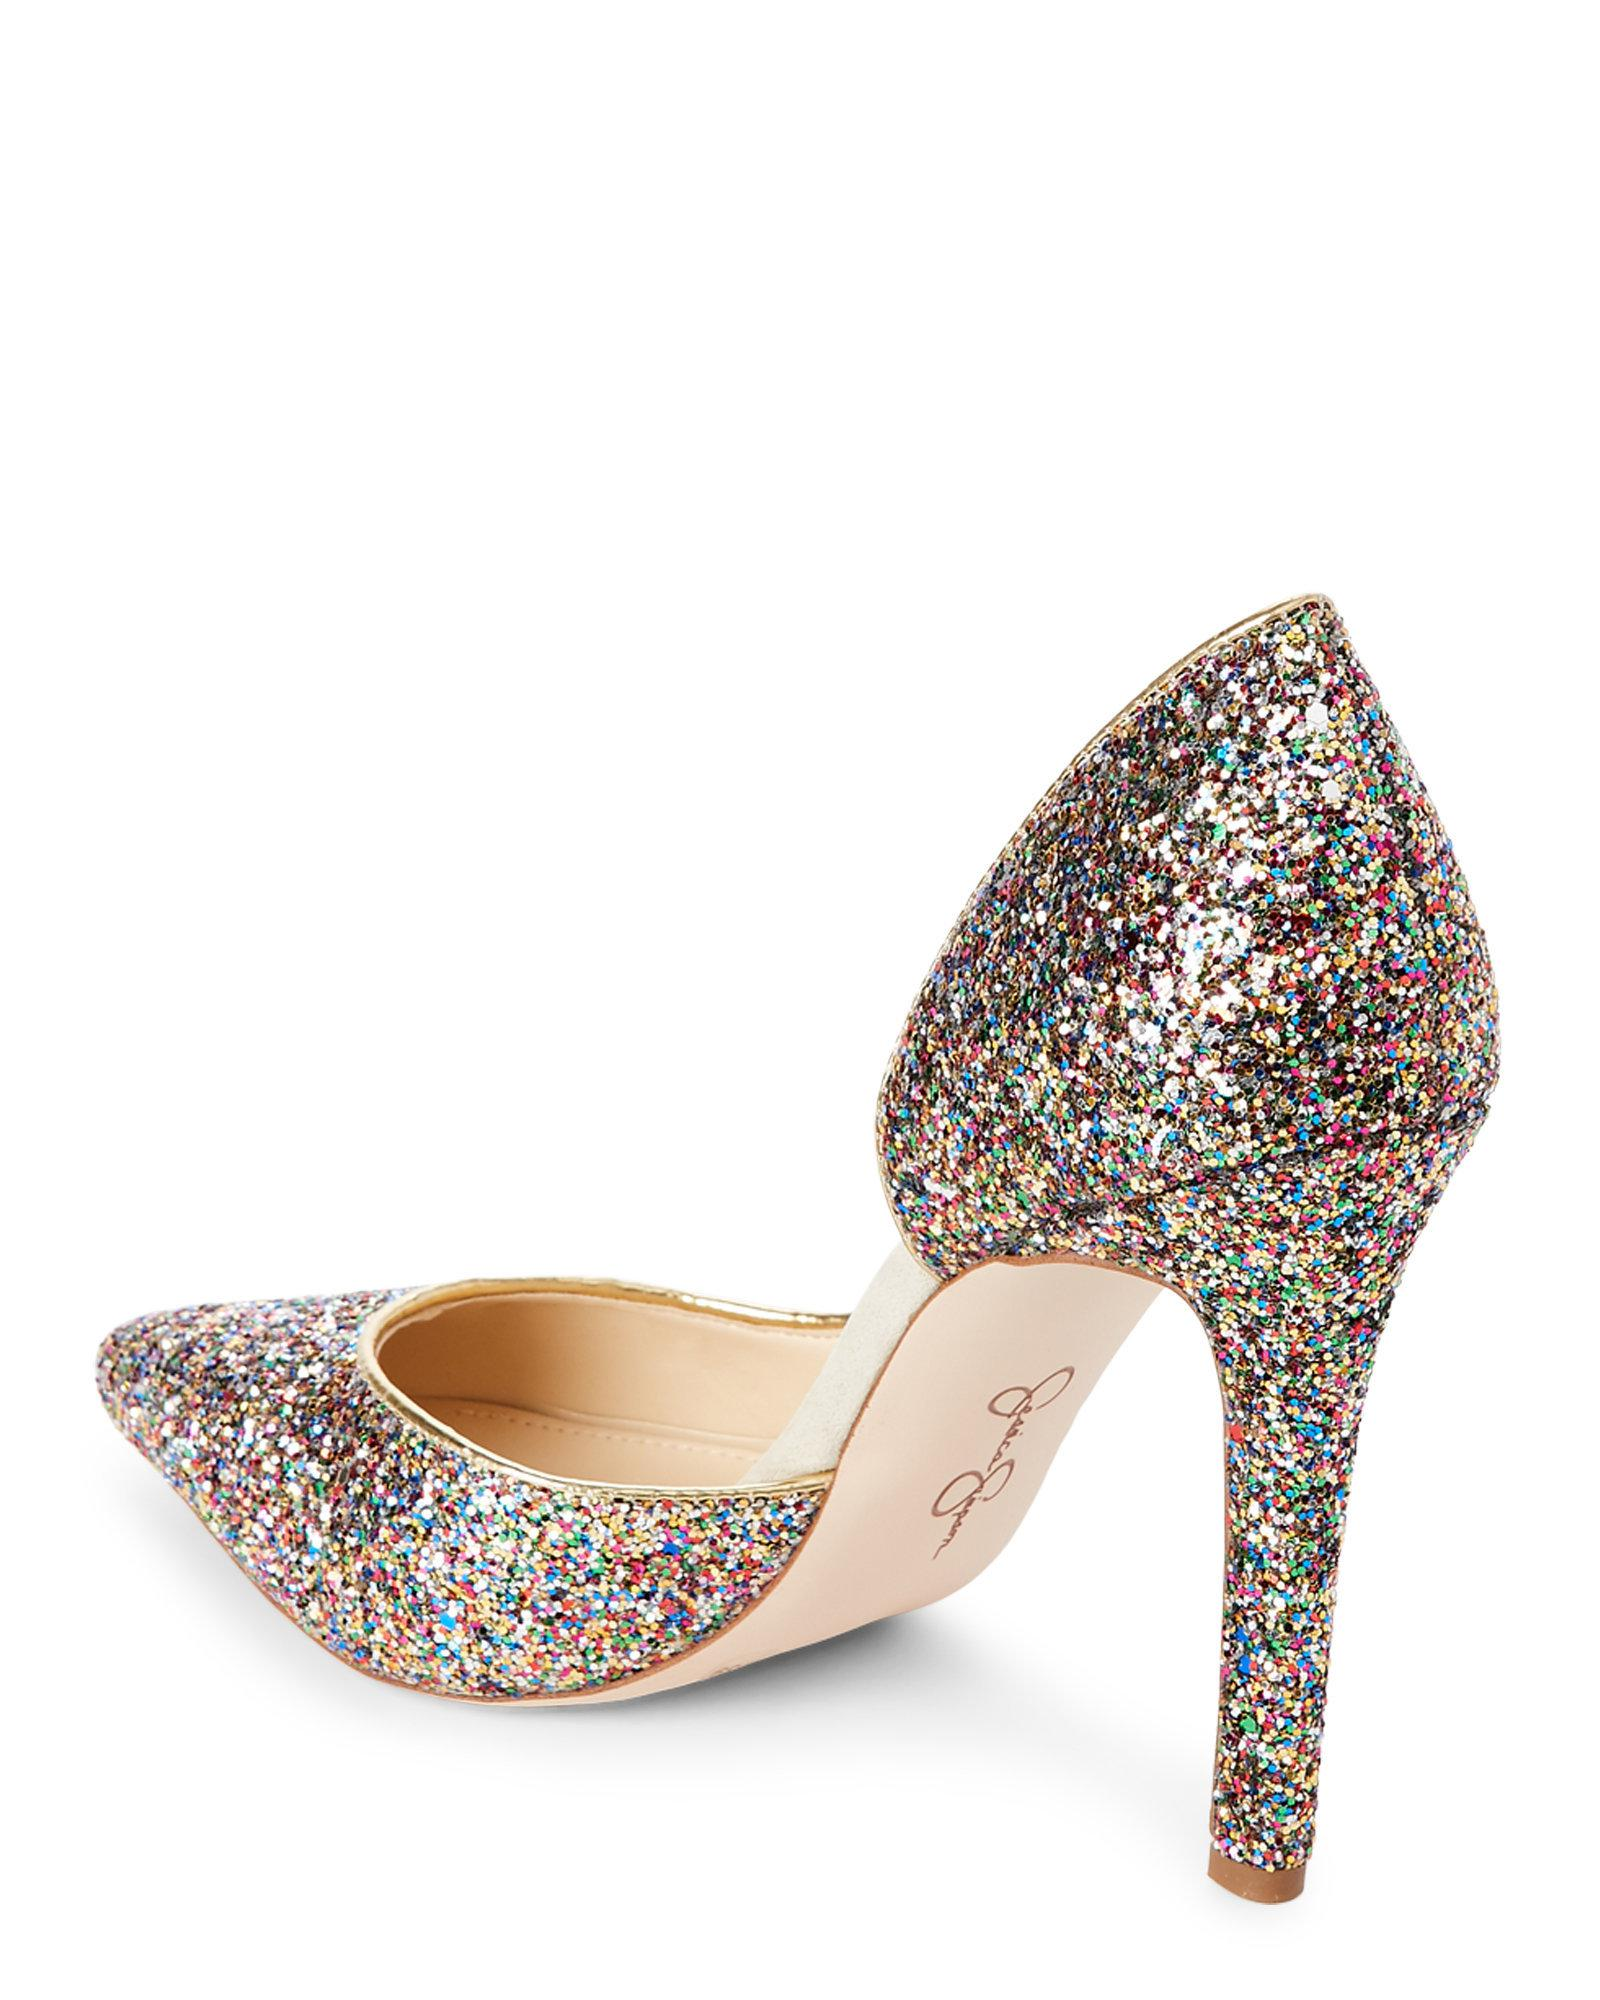 dc418ab4bc6c Lyst - Jessica Simpson Rainbow Claudette Pointed Toe Glitter Pumps